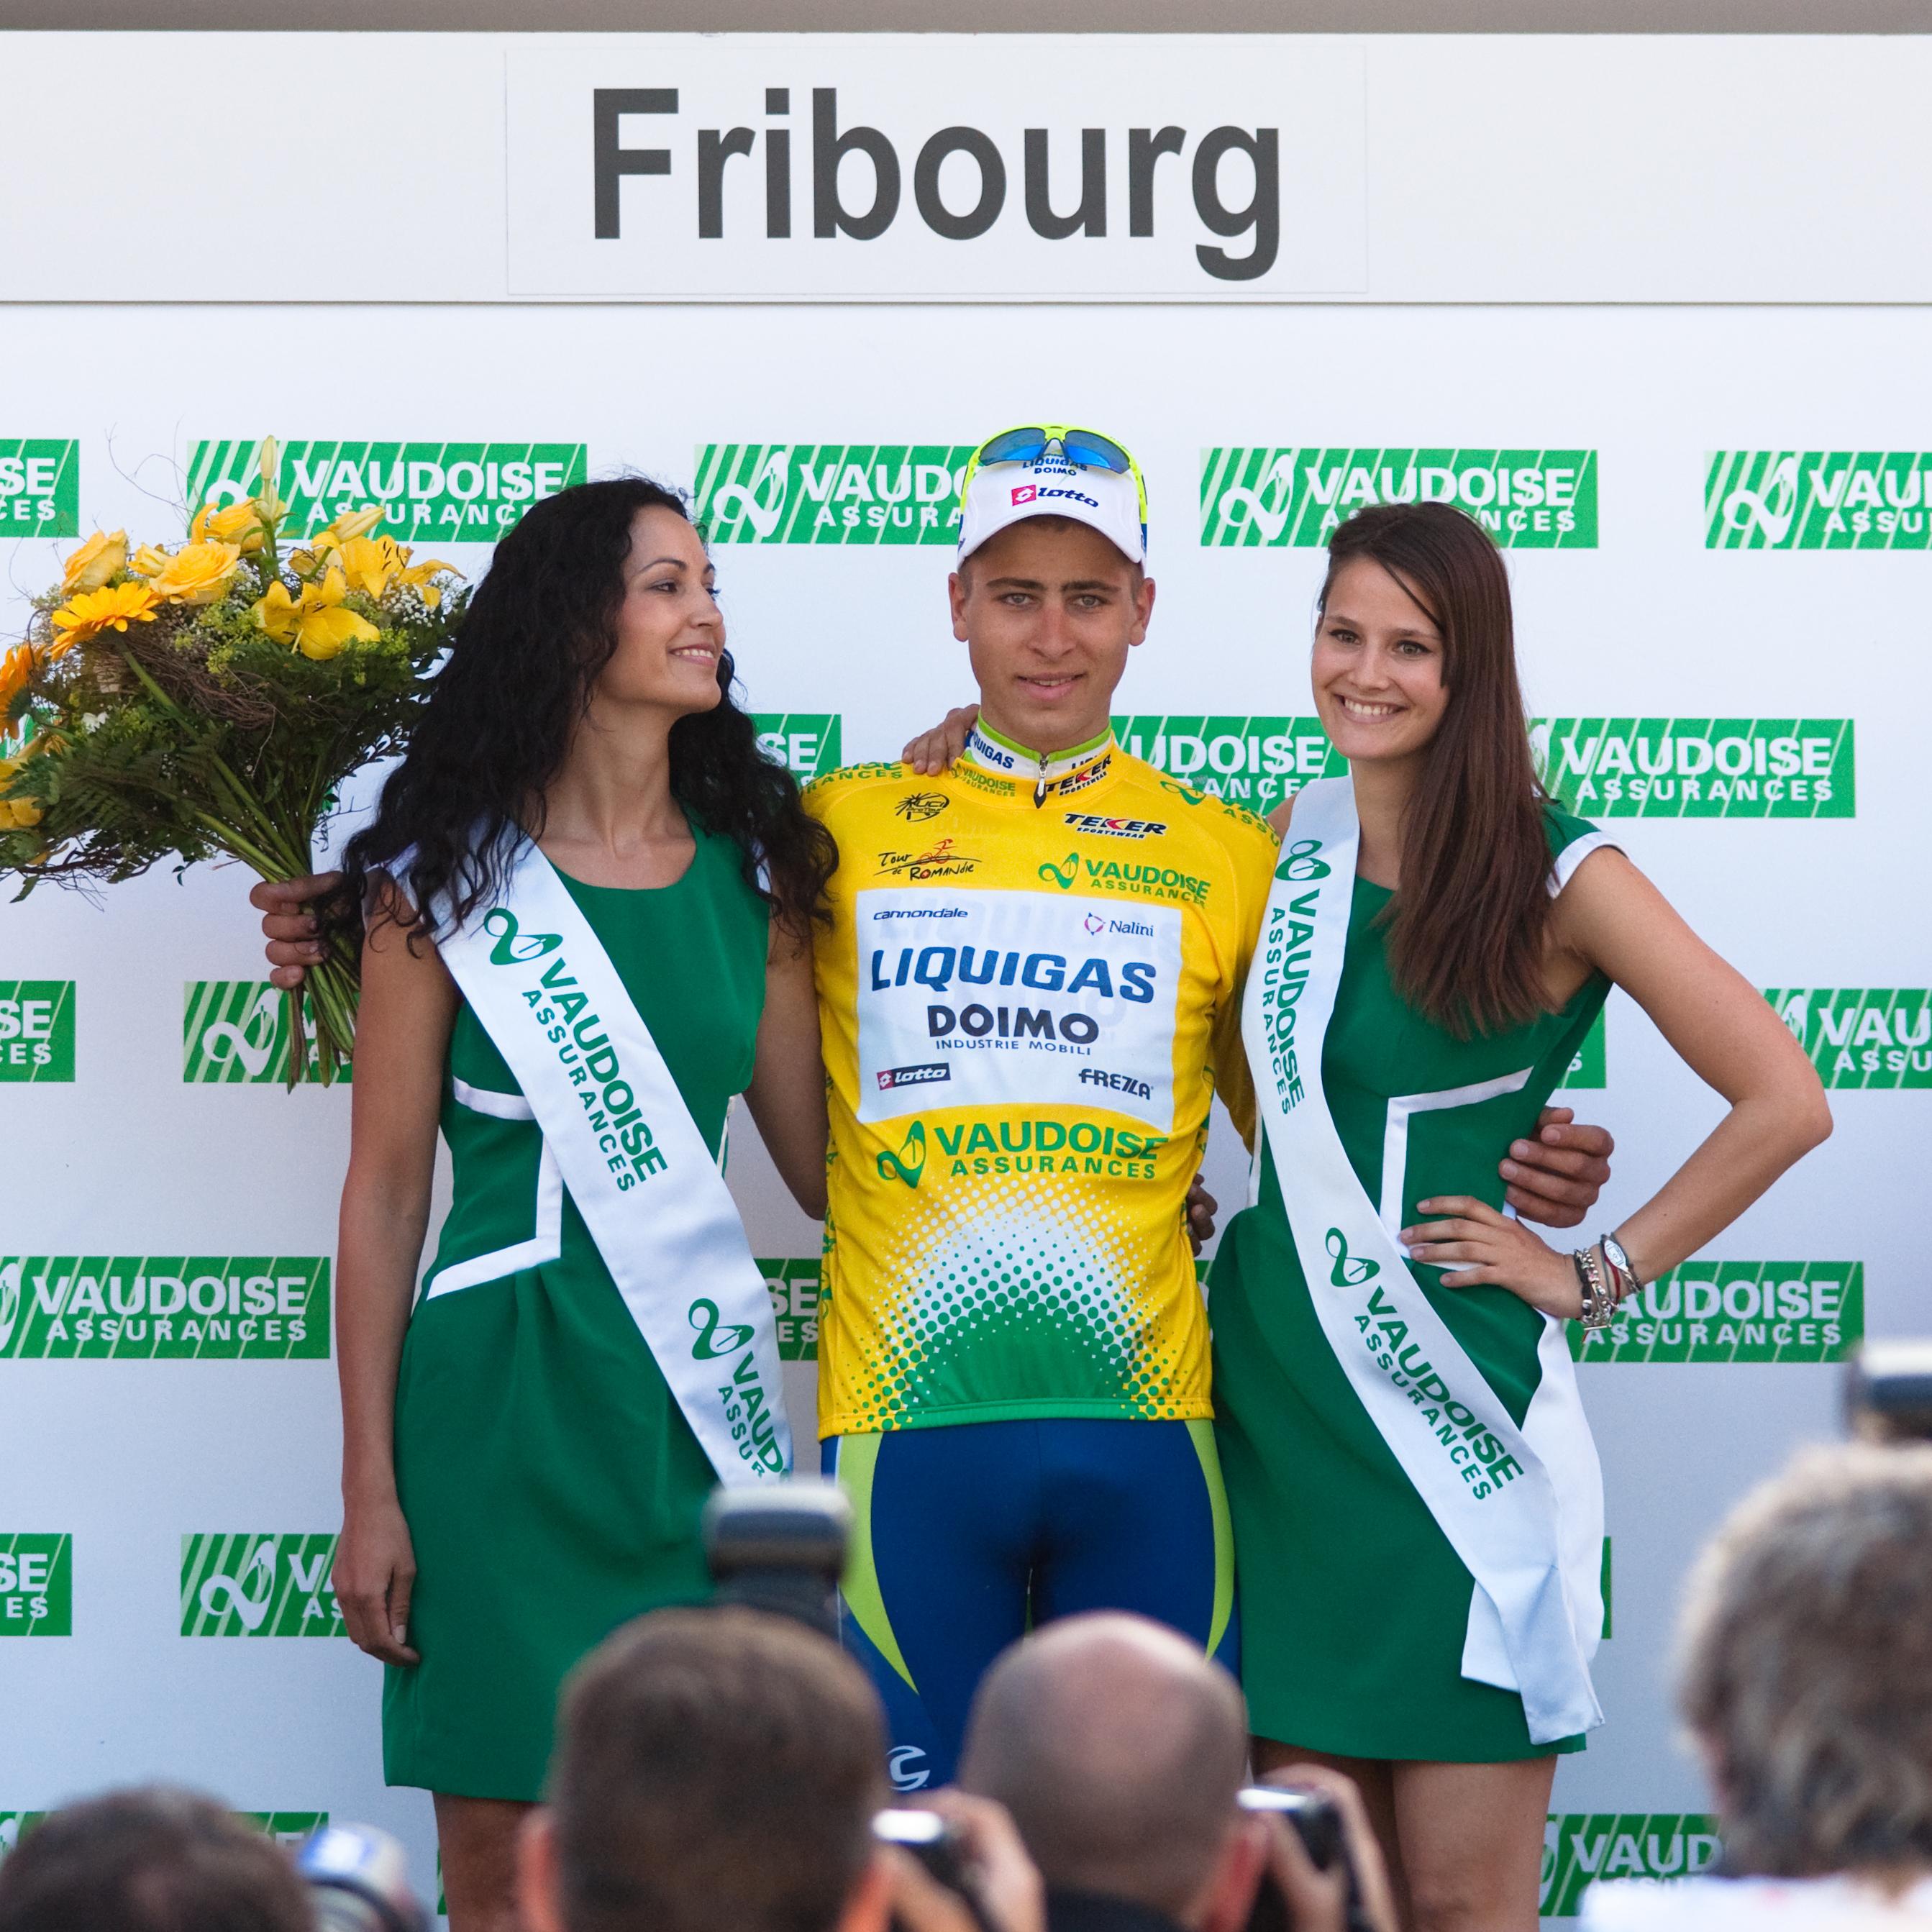 Podium Girl Tour De France